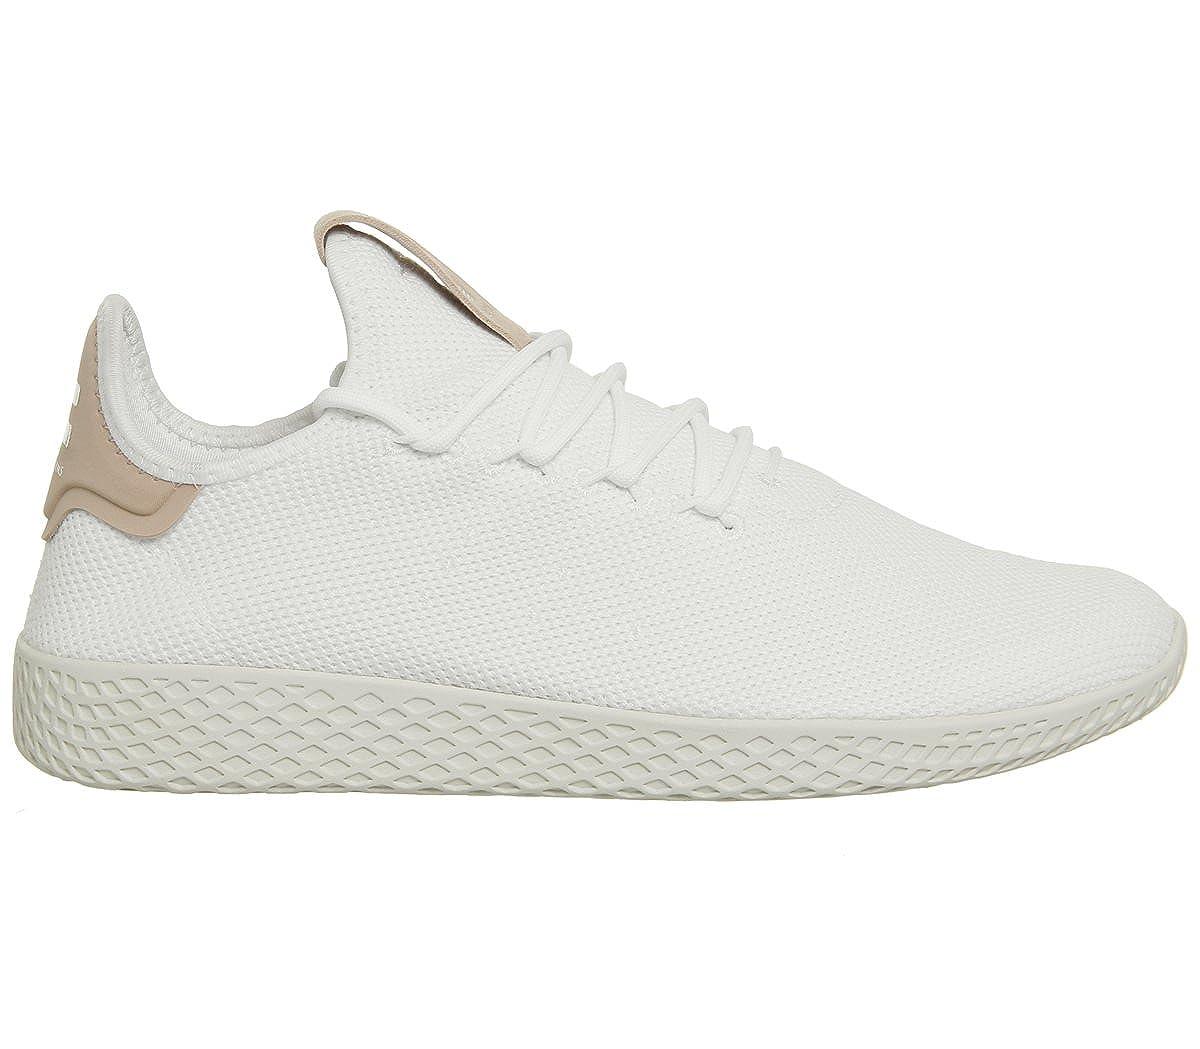 size 40 65548 27a60 Amazon.com  adidas Originals PW Tennis Hu Shoes 10.5 B(M) US Women  9.5  D(M) US White  Fashion Sneakers